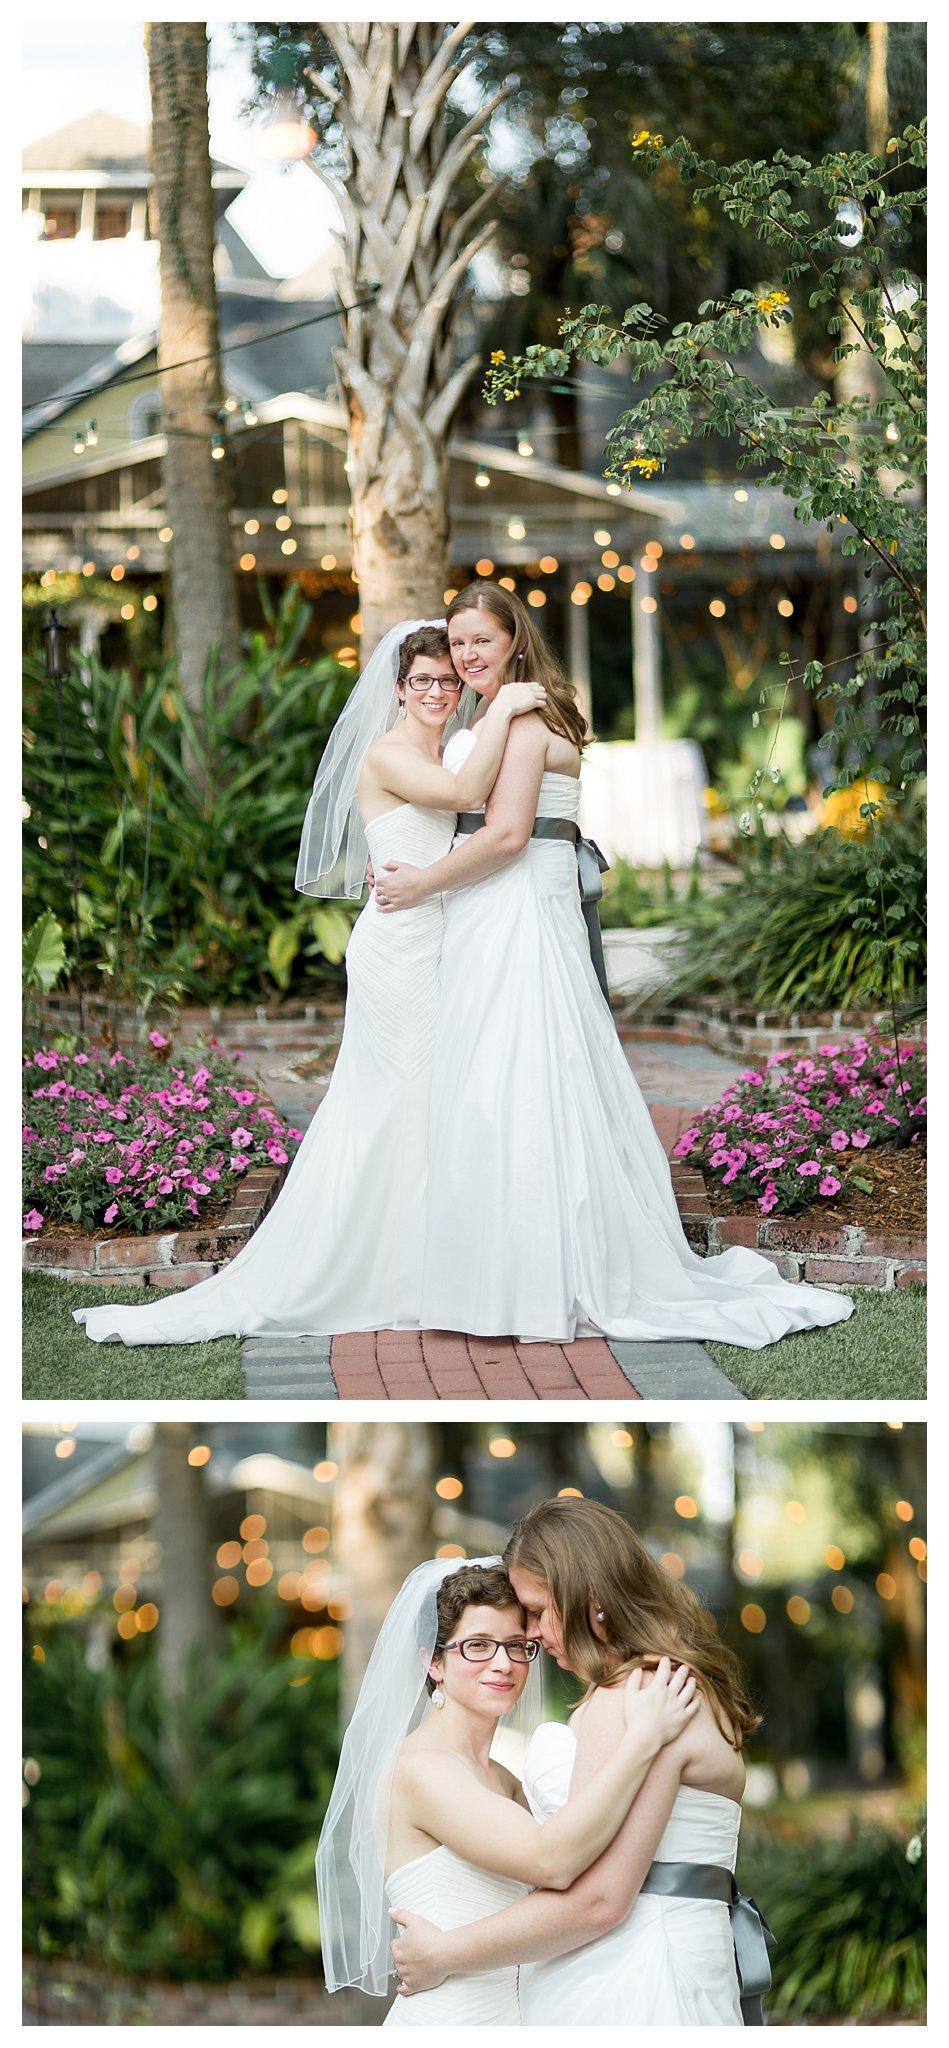 everleigh-photography-cincinnati-wedding-photographer-cincinnati-wedding-photography-sweetwater-branch-inn-gainesville-florida-wedding-19